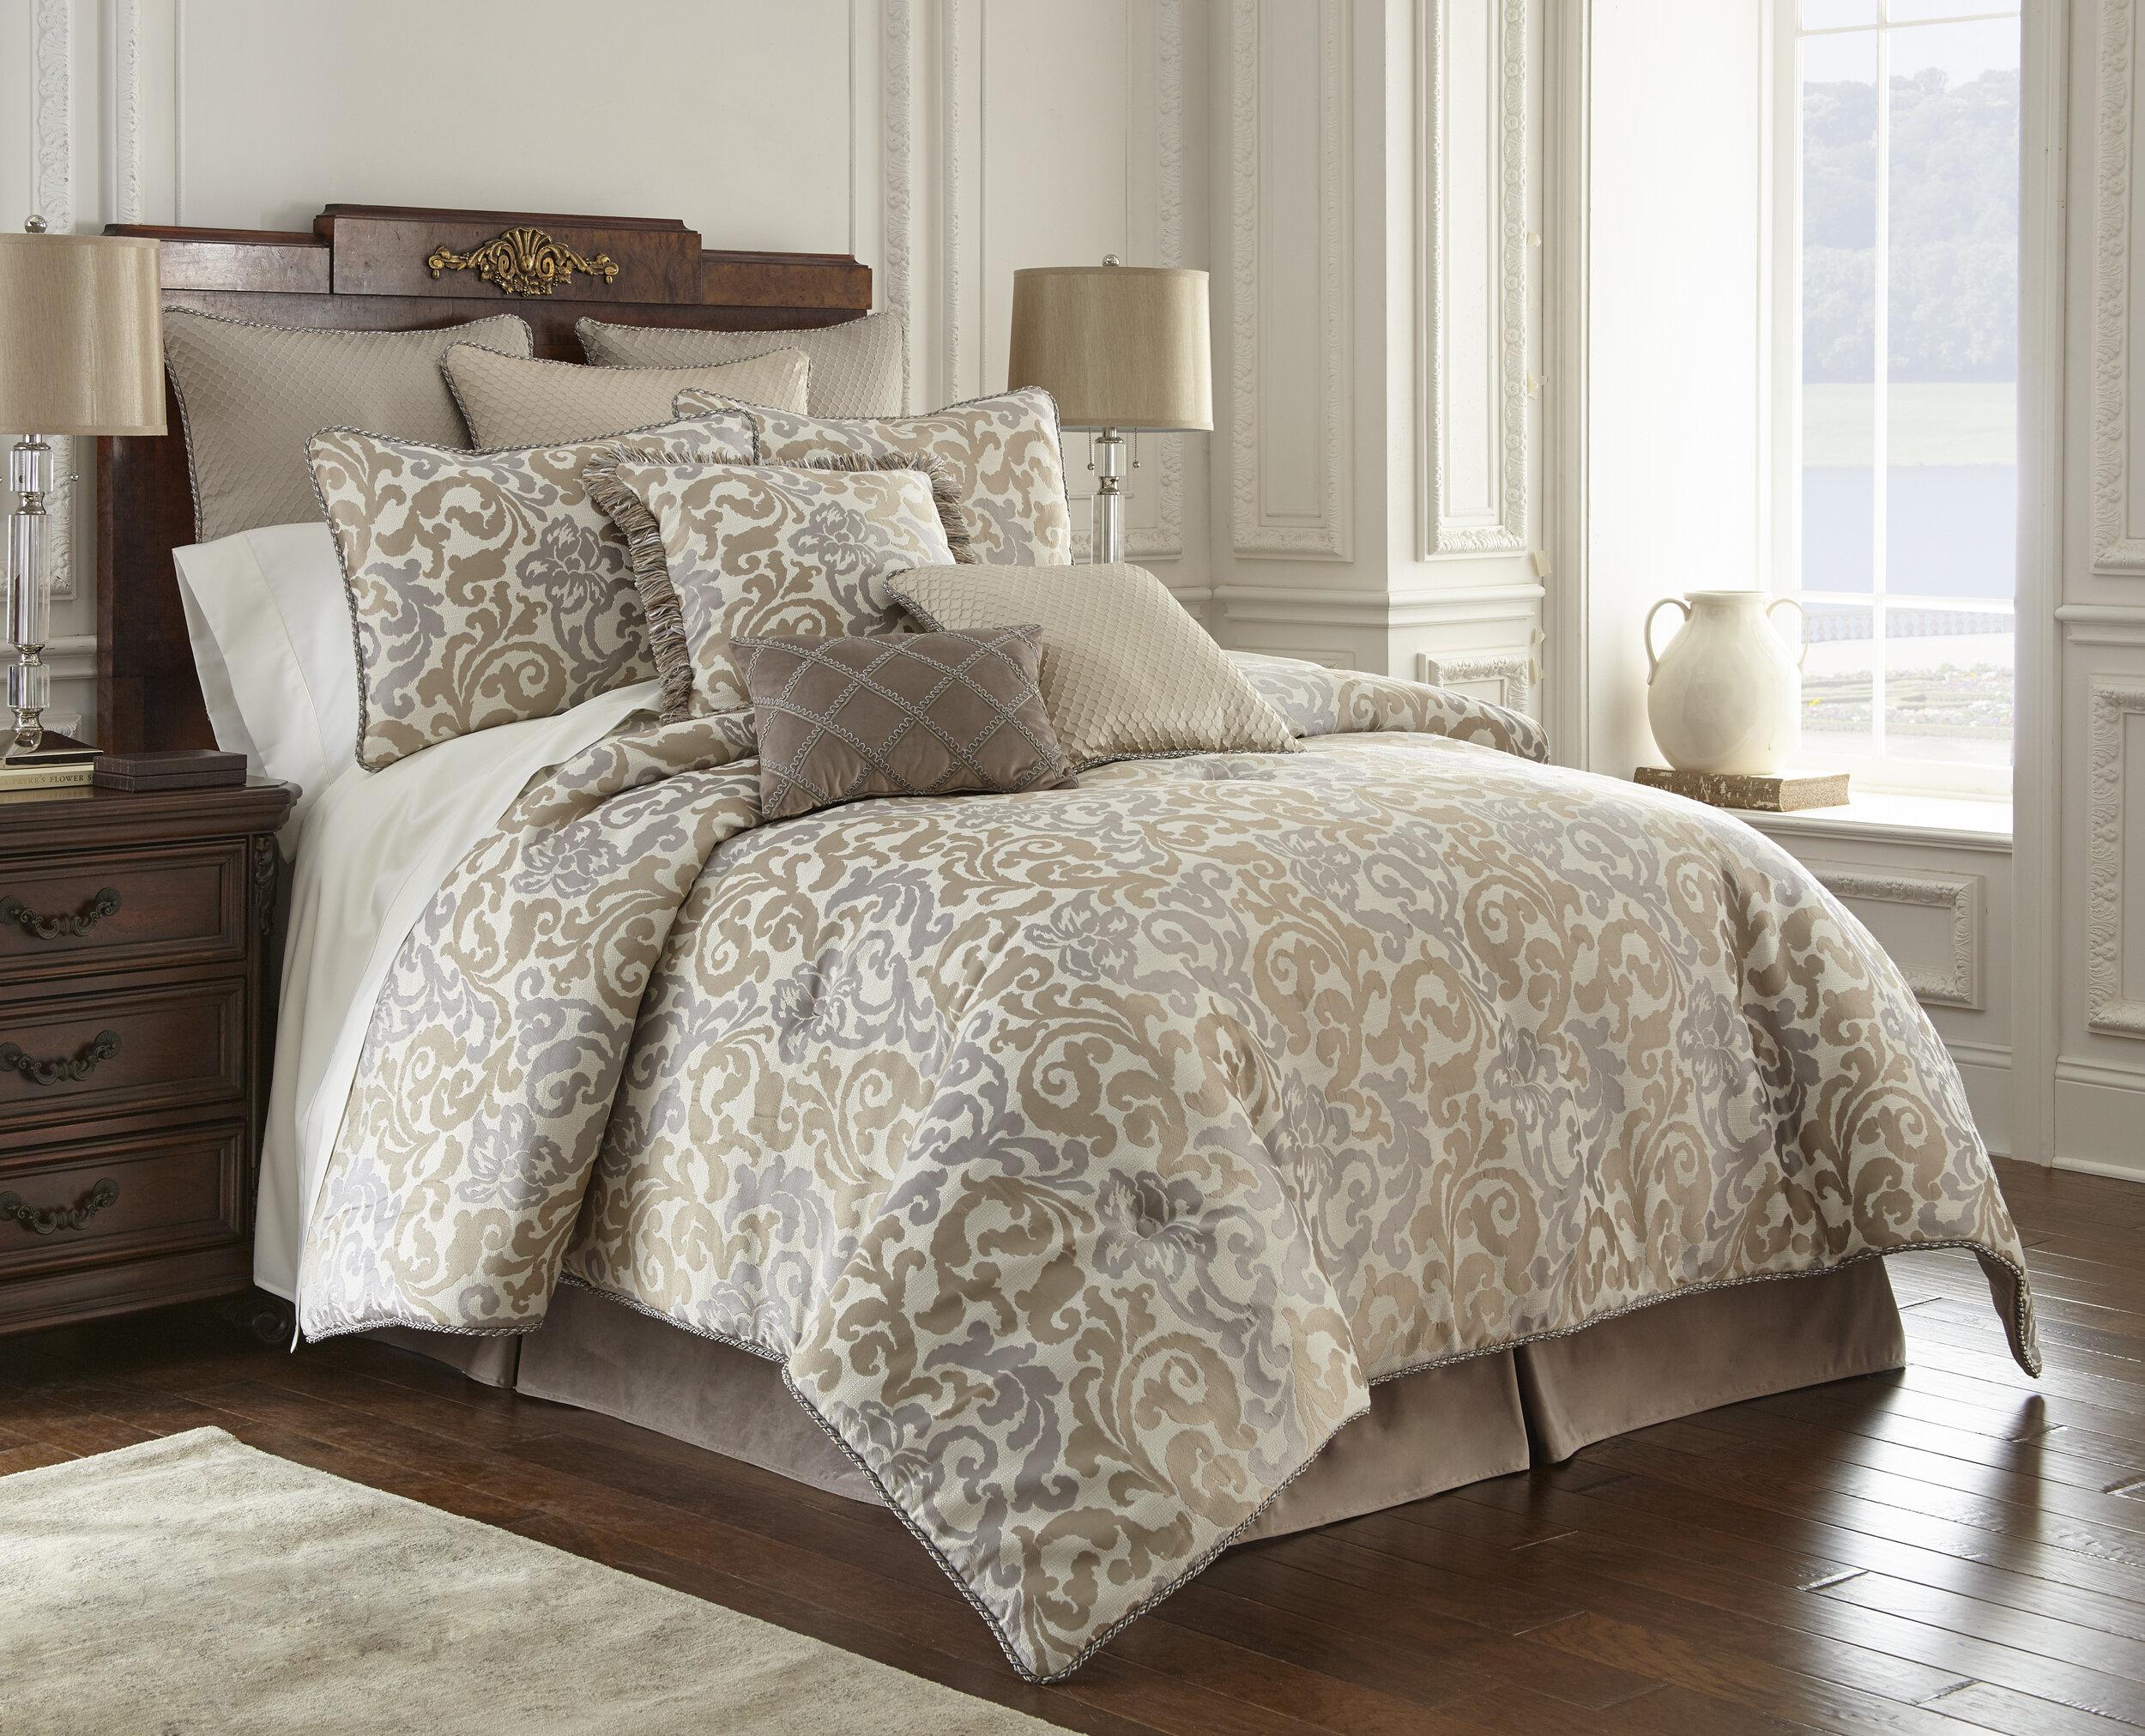 suede plush com sherpa ernest chic set comforter microsuede home micro ip walmart blanket